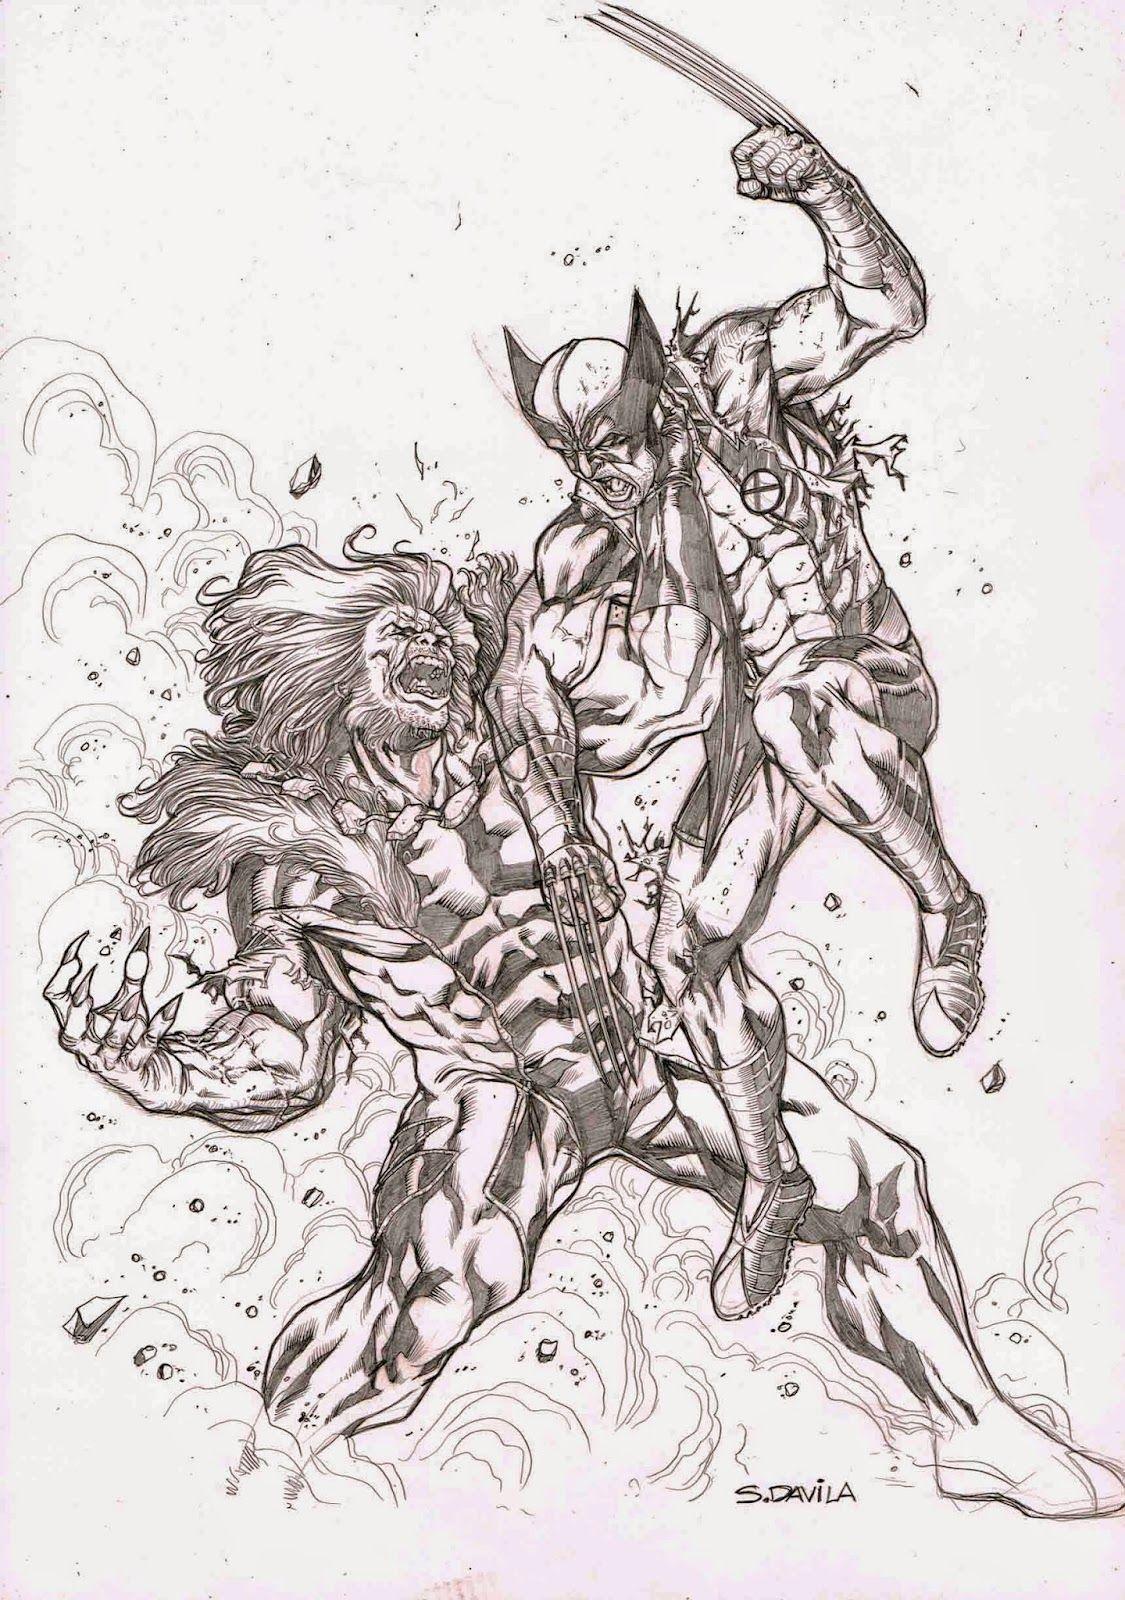 Sergio F Davila Sergio Davila Comic Art Drawings